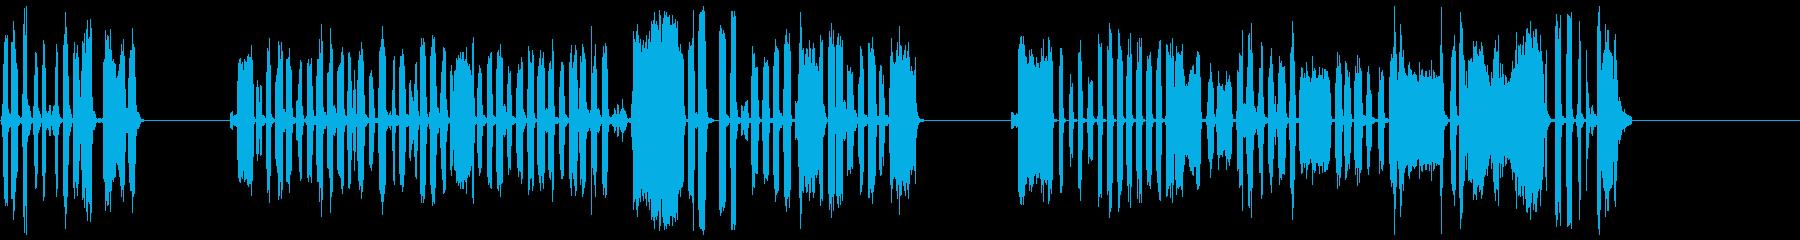 DJスクラッチパフォーマンス4-6の再生済みの波形